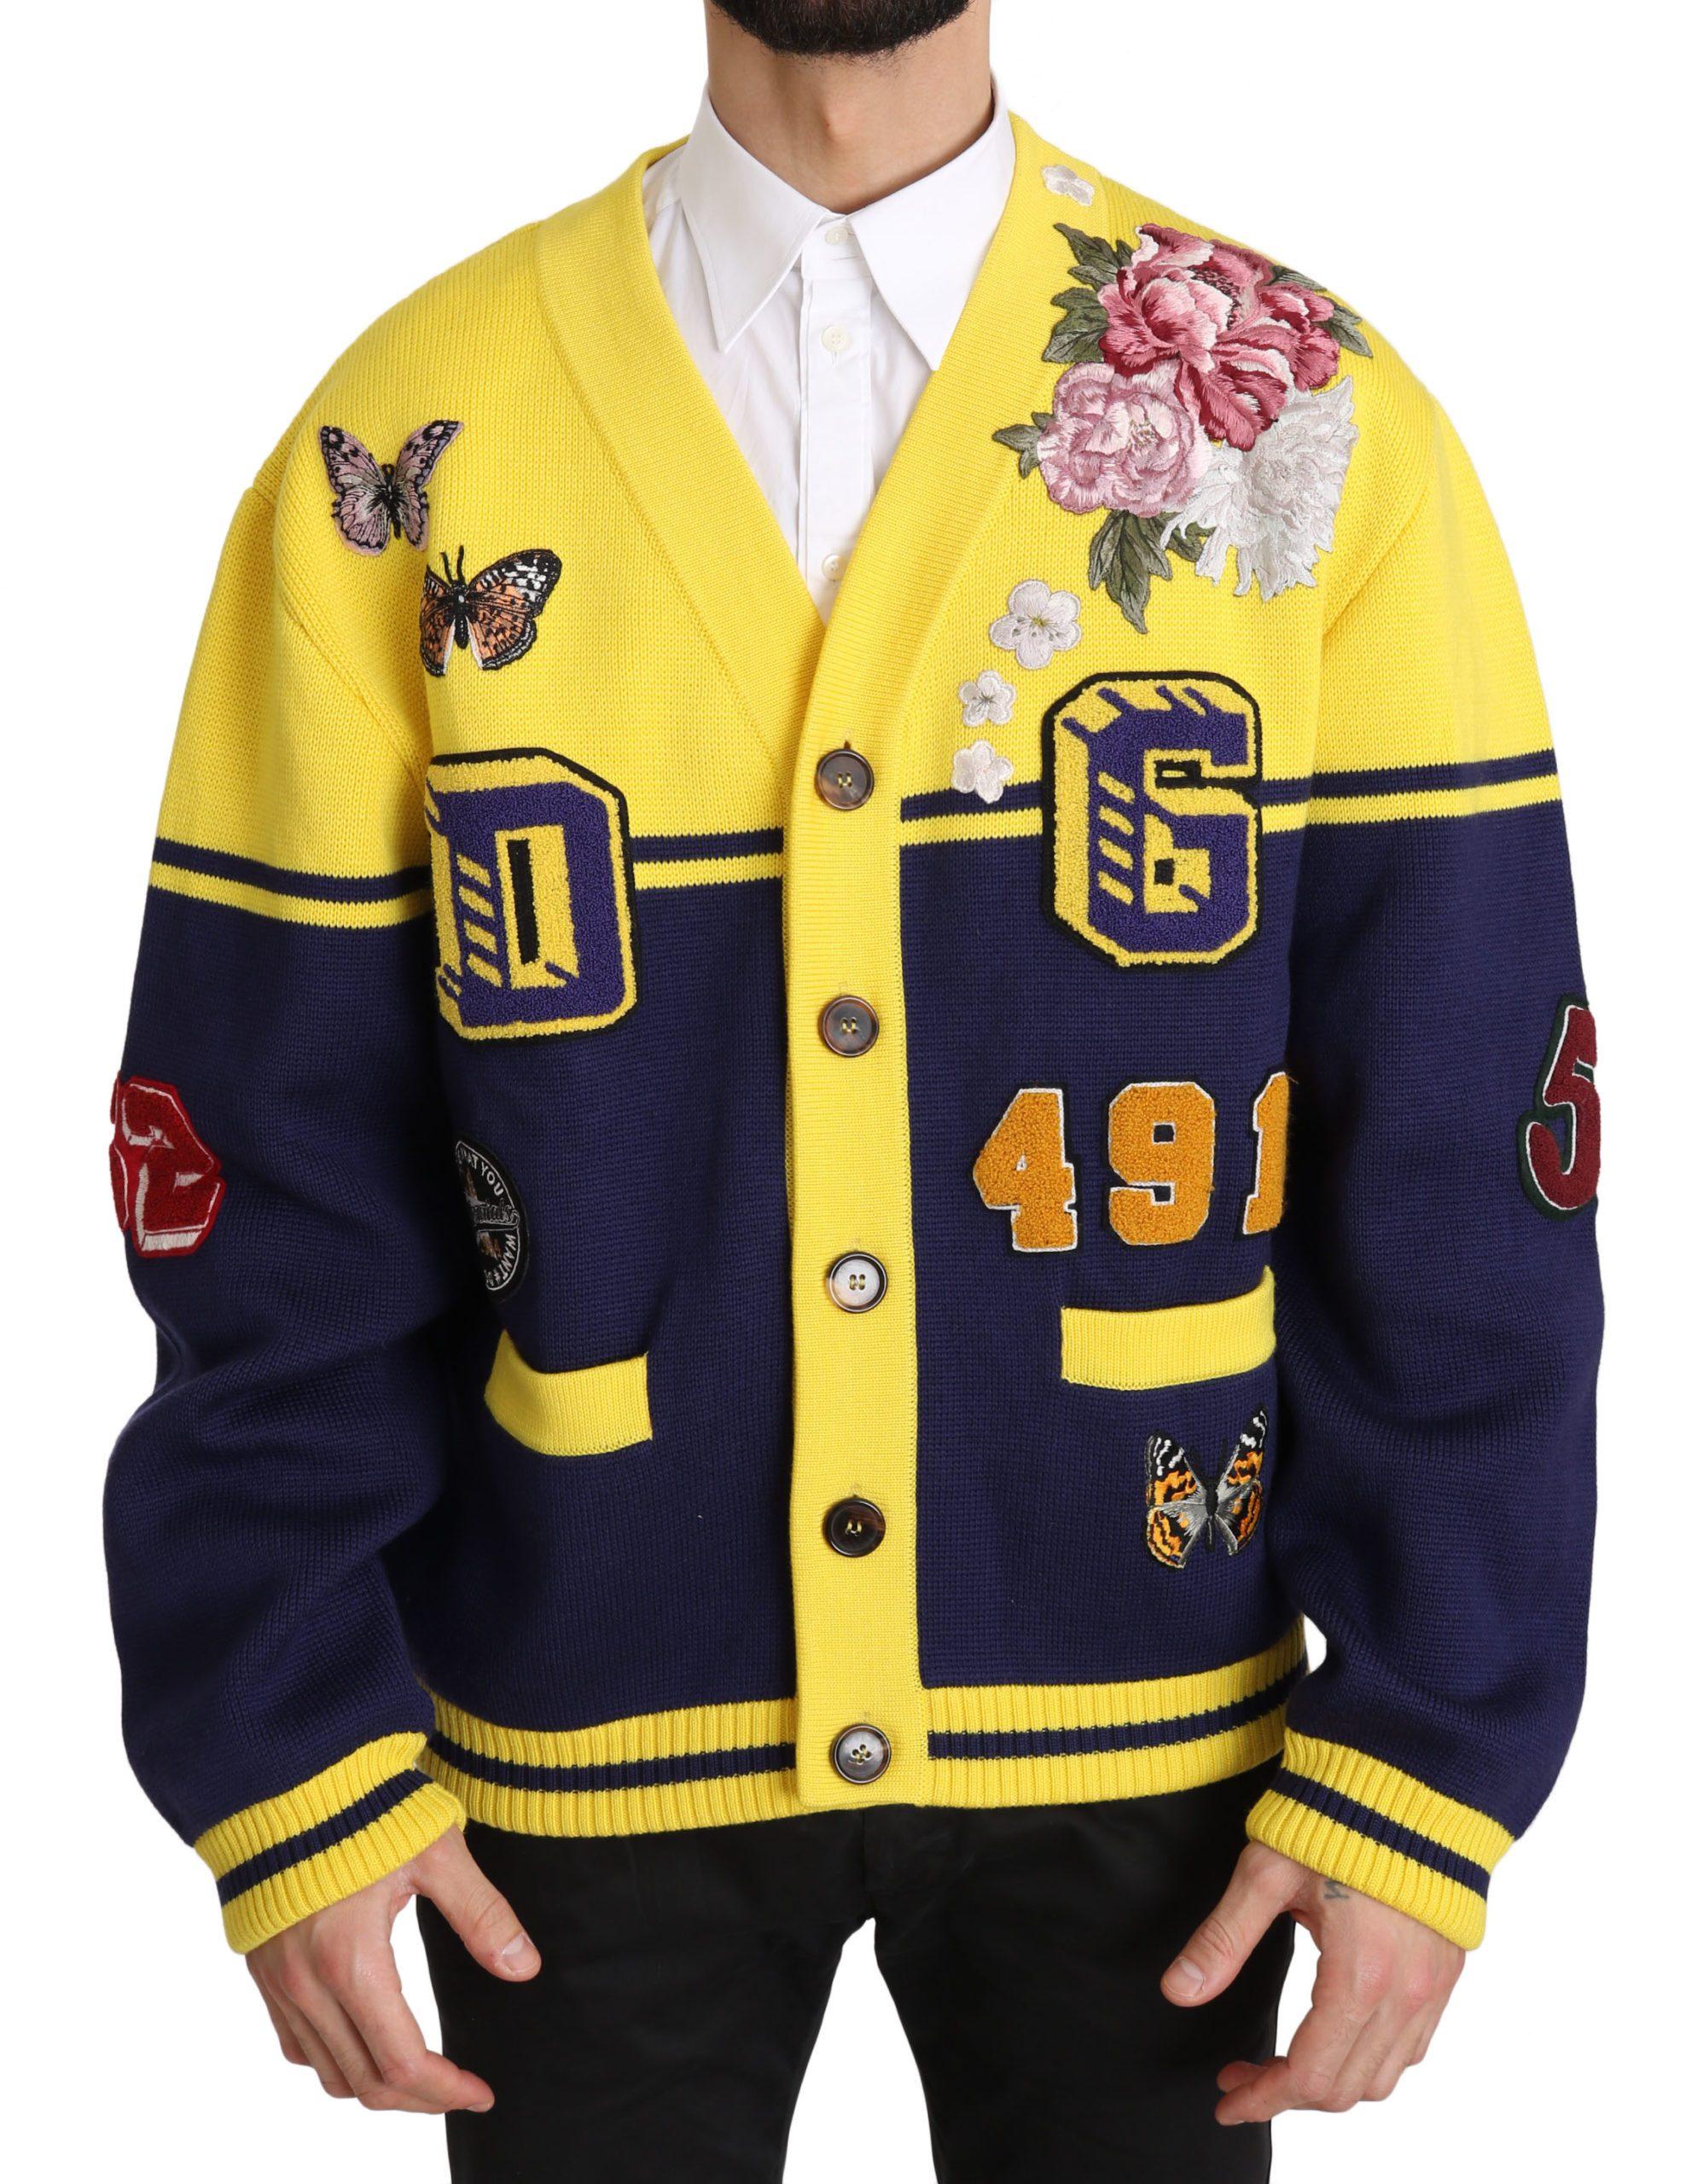 Dolce & Gabbana Men's Varsity Button Wool Sweater Yellow JKT2358 - IT50 | L